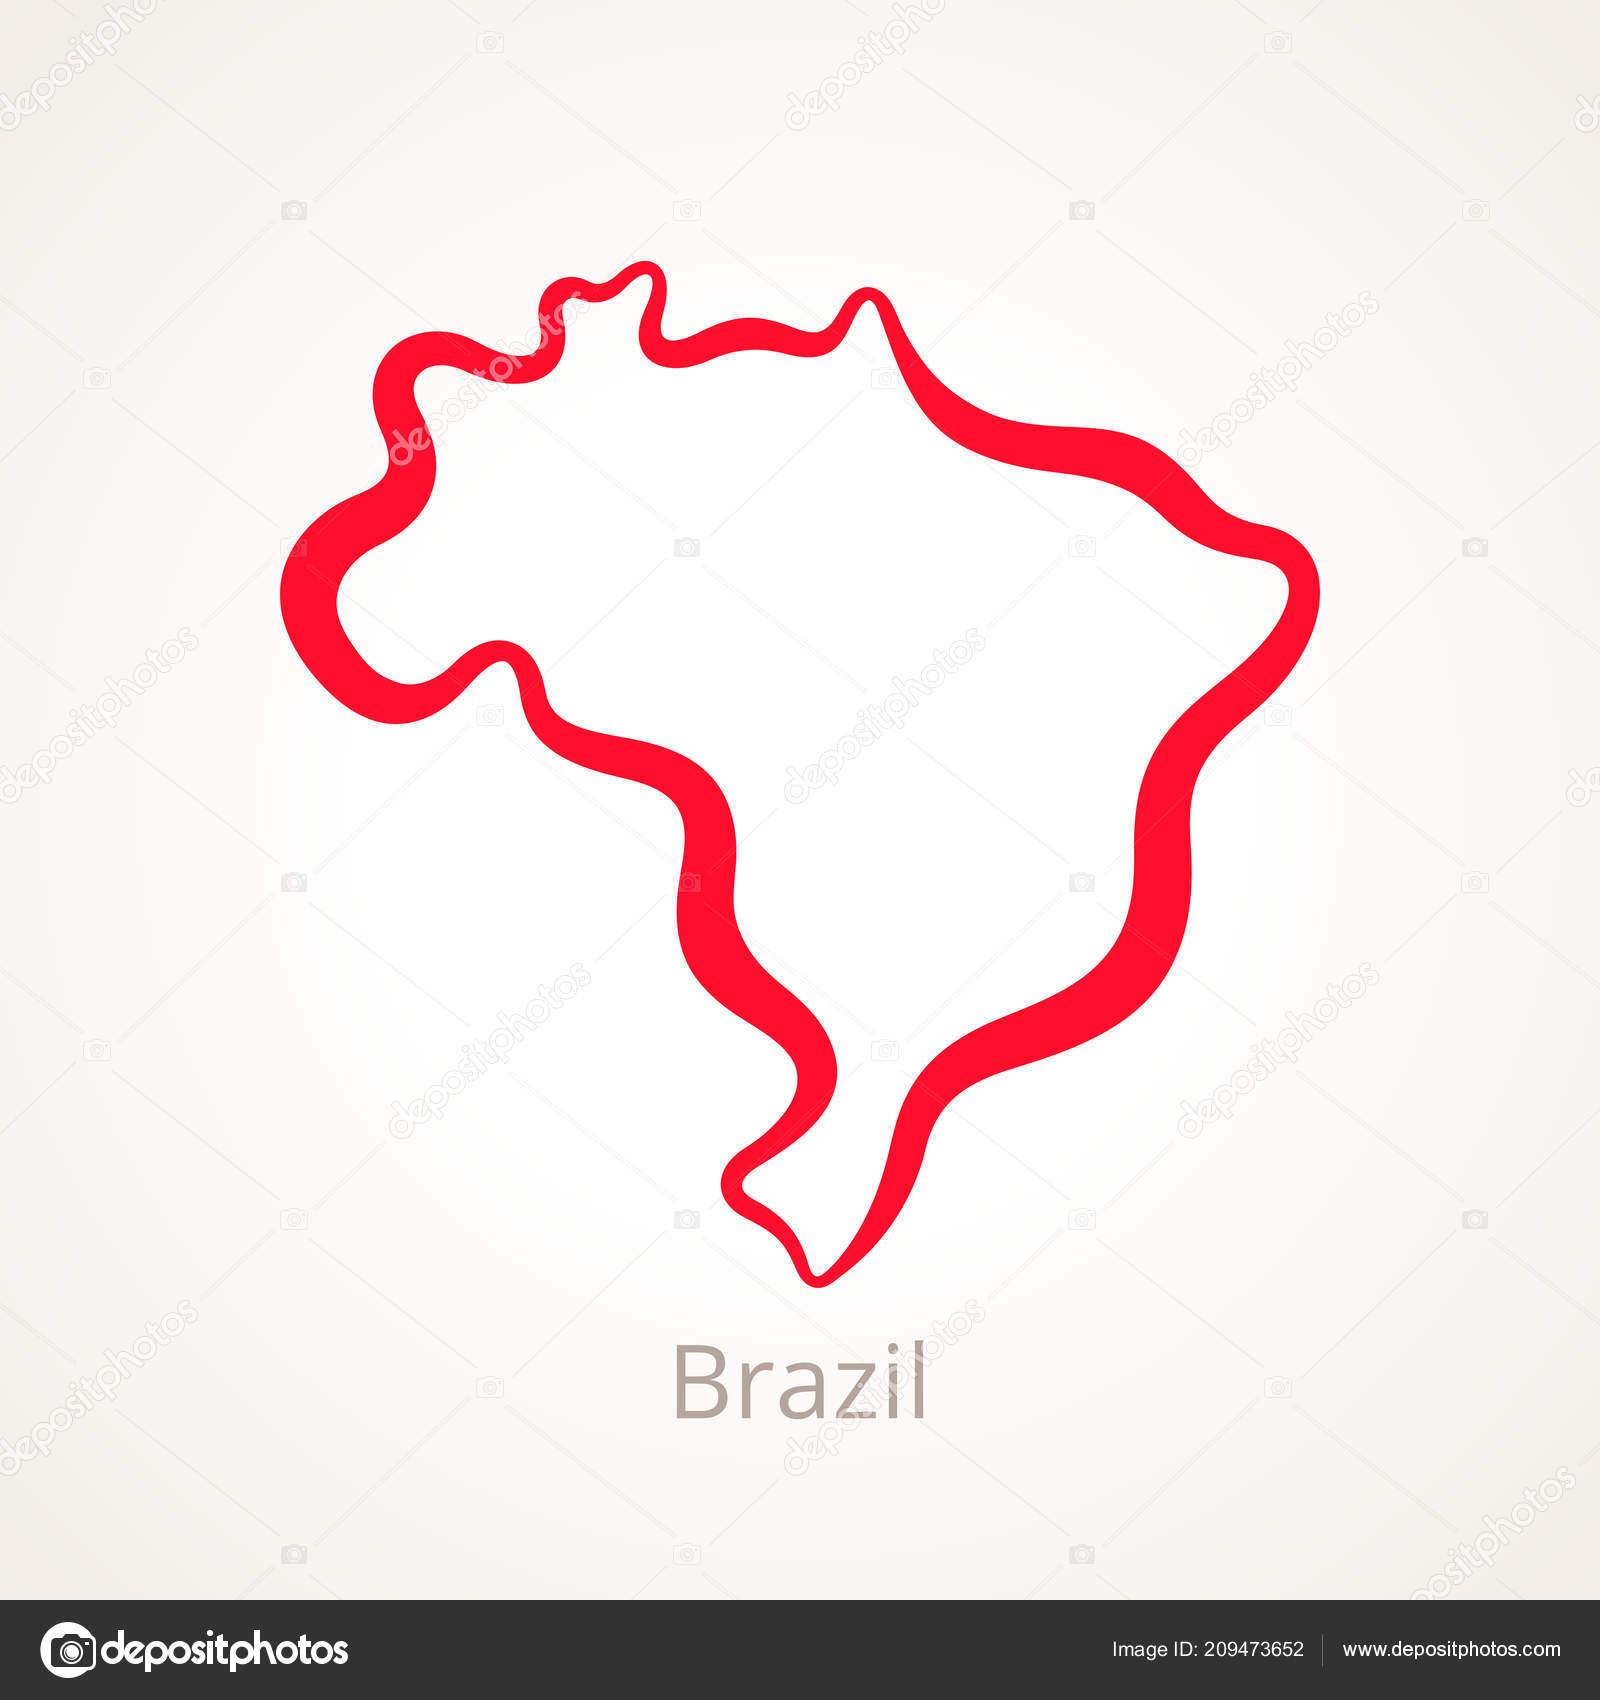 Carte Muette Bresil.Carte Muette Bresil Marque Avec Ligne Rouge Image Vectorielle